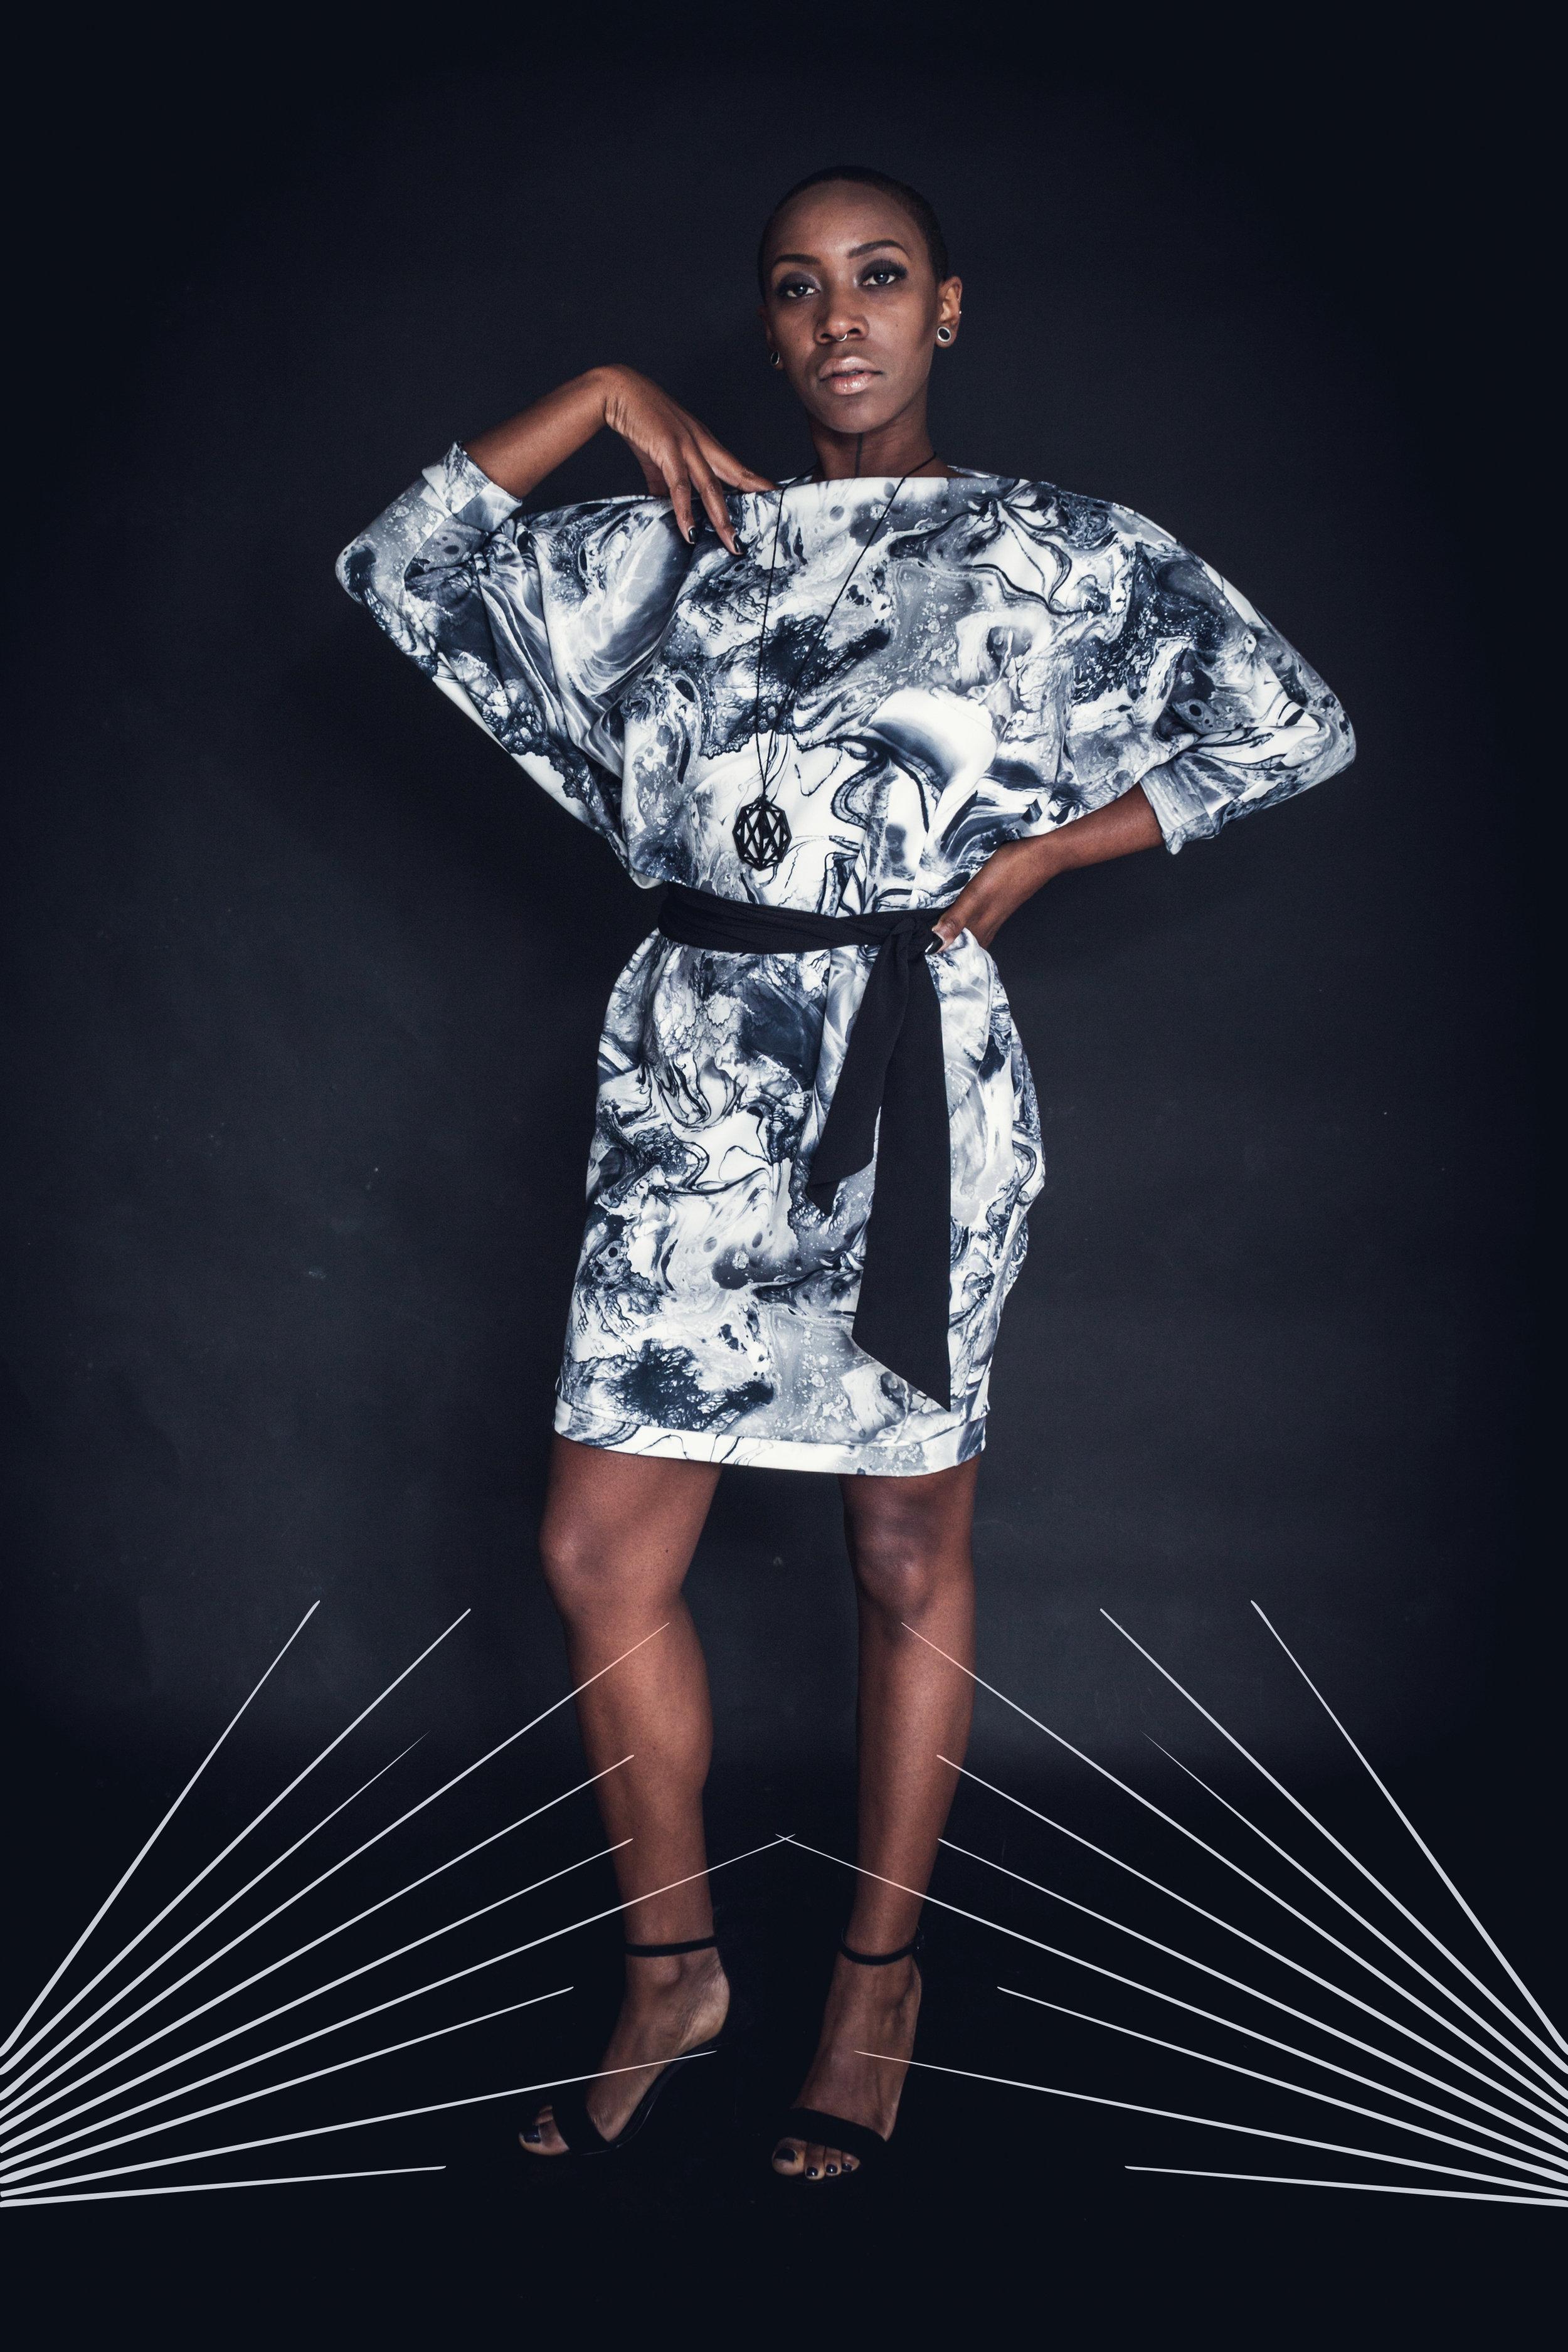 zaramia-ava-zaramiaava-leeds-fashion-designer-leedsfashiondesigner-stylist-leeds-stylist-leedsstylist-ethical-sustainable-minimalist-versatile-drape-Ayaka-marble-print-dress-black-belt-1.jpg